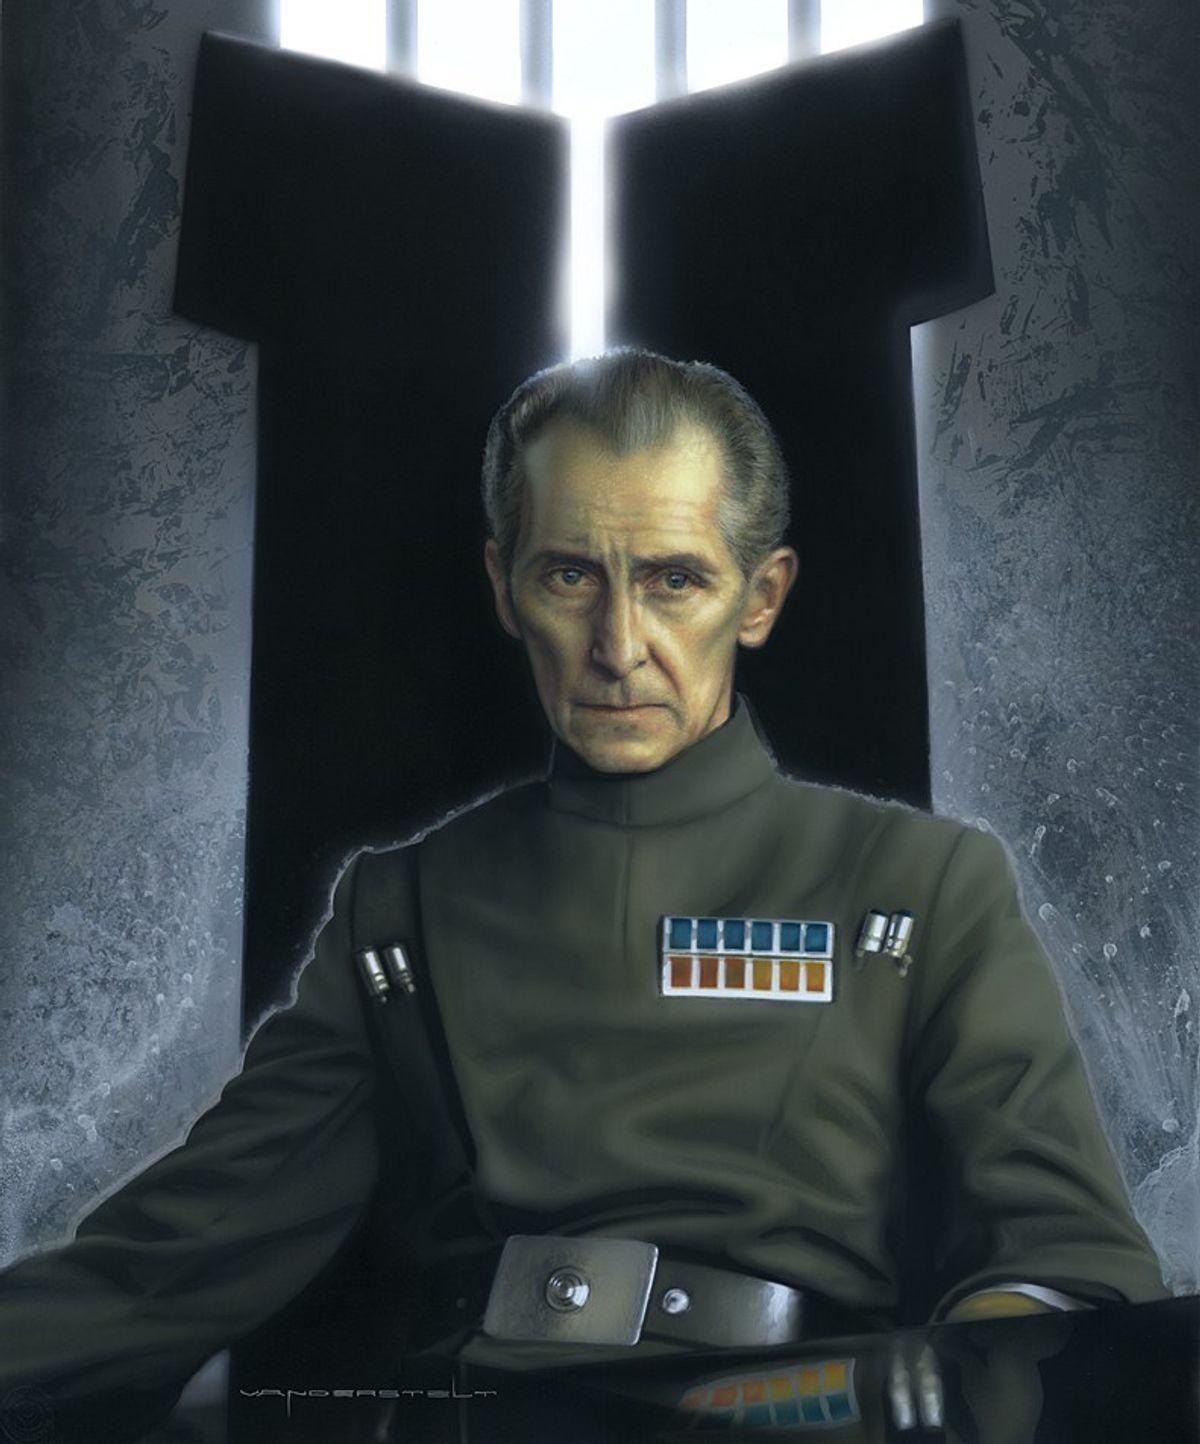 The New Star Wars Sees the Return of Tarkin